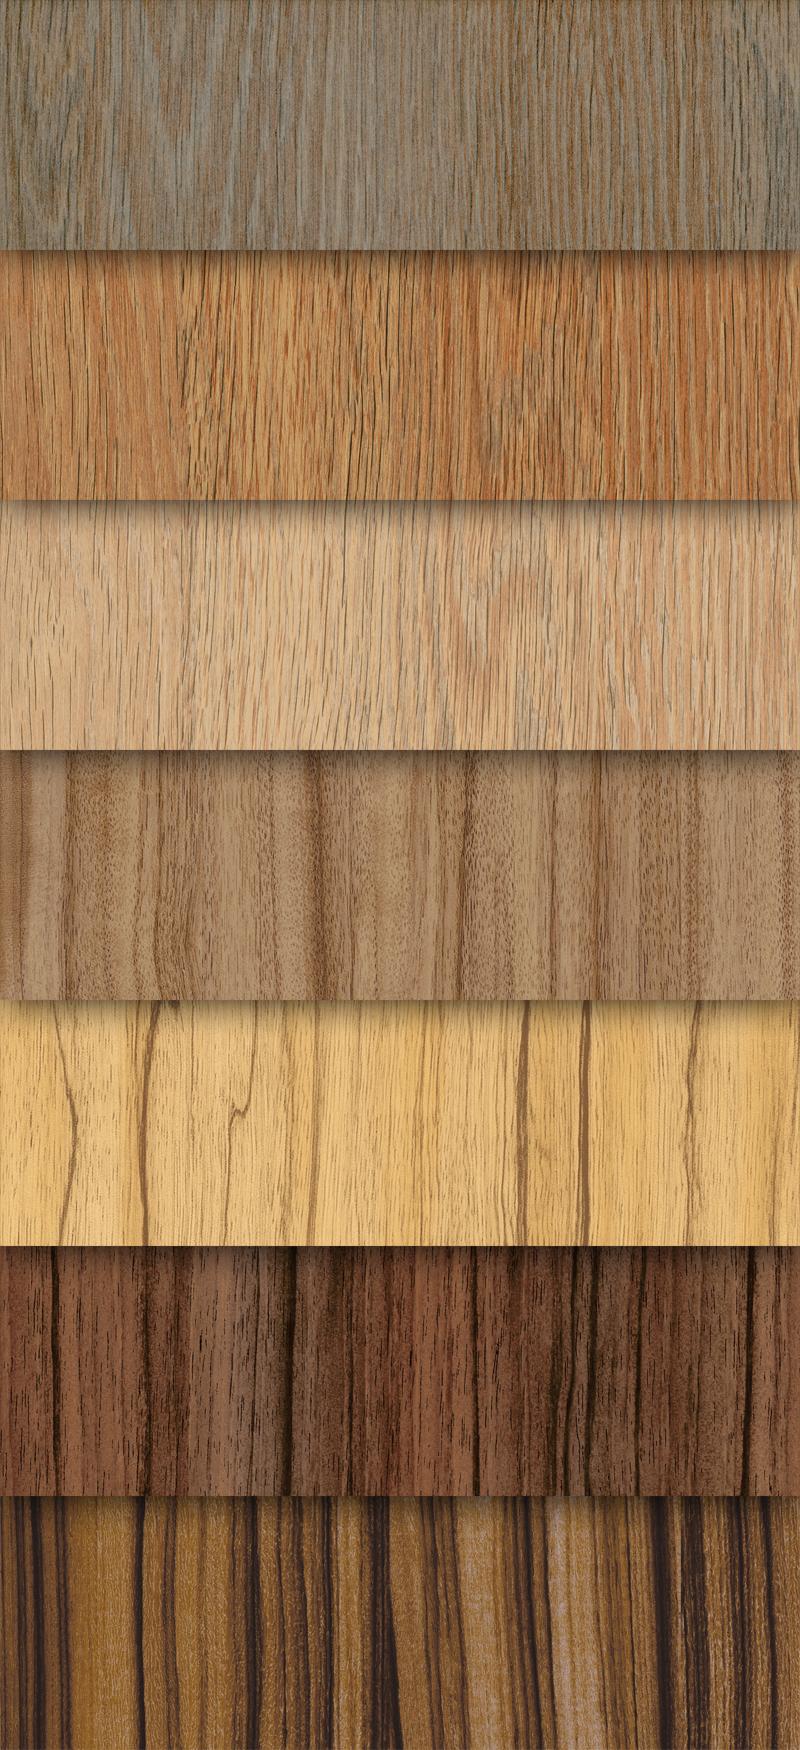 Natural Wood Grain Textures And Patterns  PSD Mockups